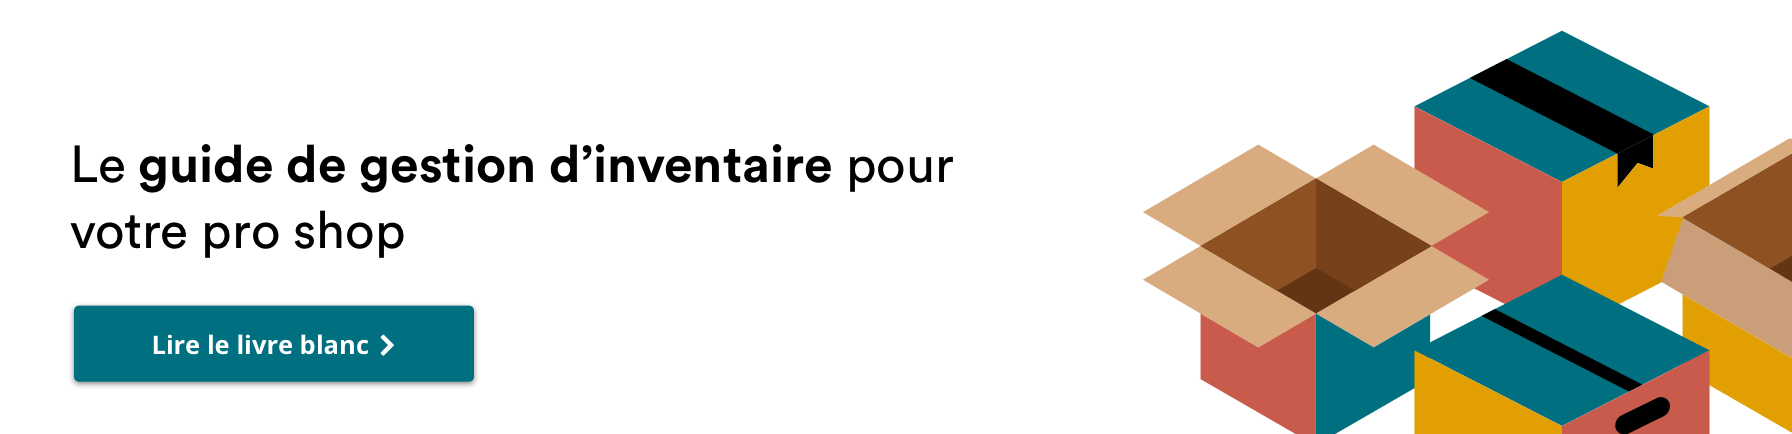 pro-shop-inventory-cta-banner-fr